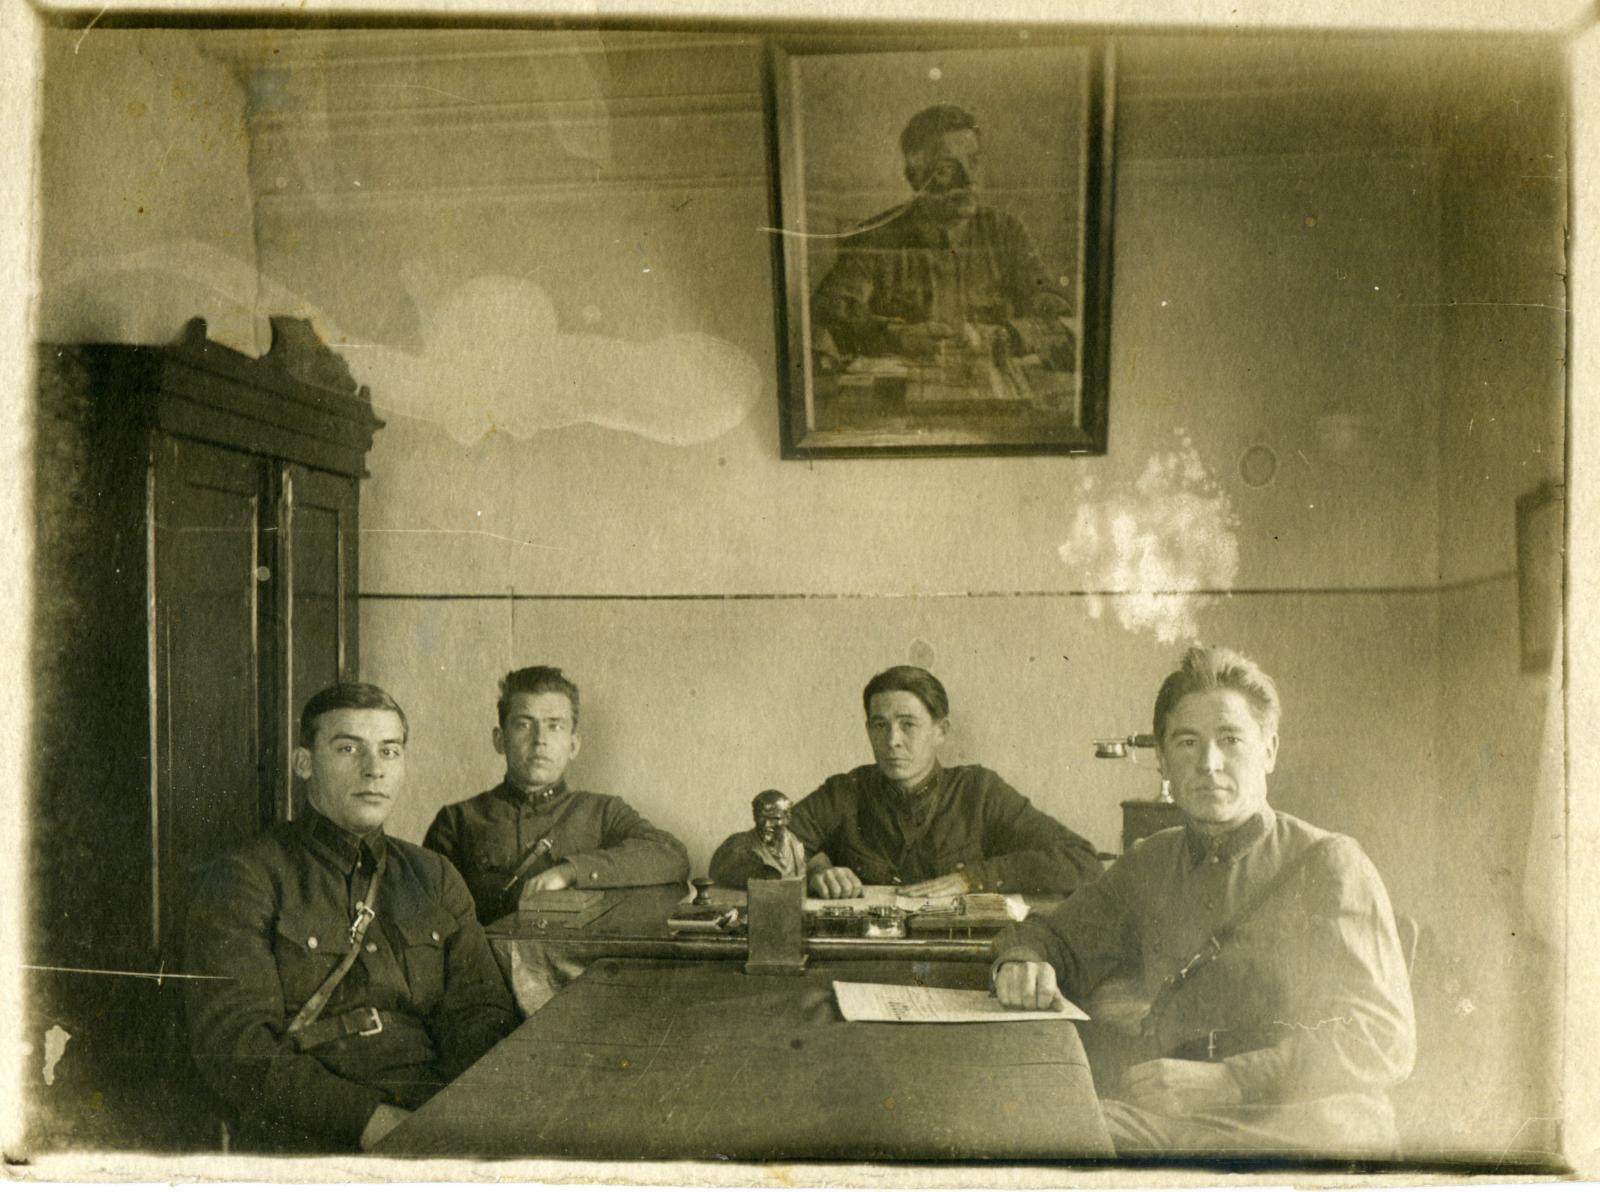 1930-е. Сотрудники ОГПУ за столом в кабинете